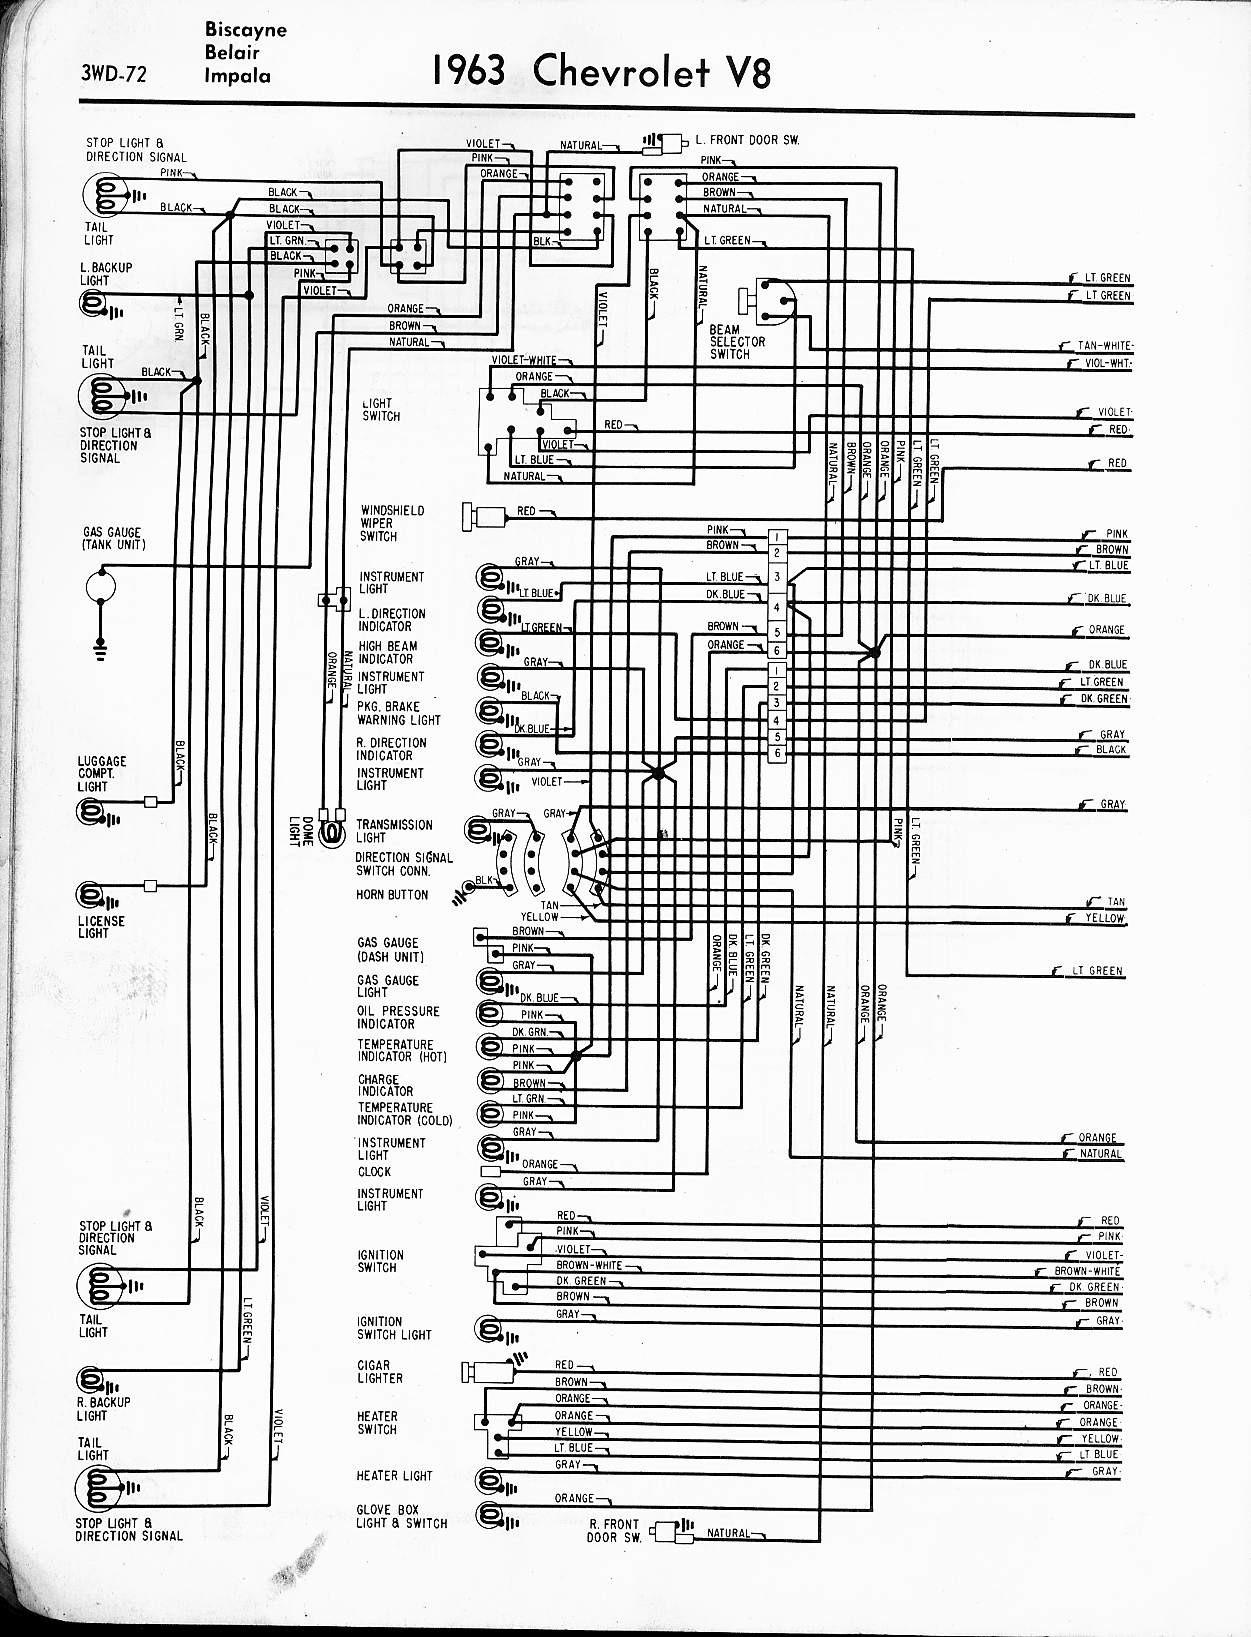 2004 Chevy Impala Engine Diagram Impala Ignition Coil